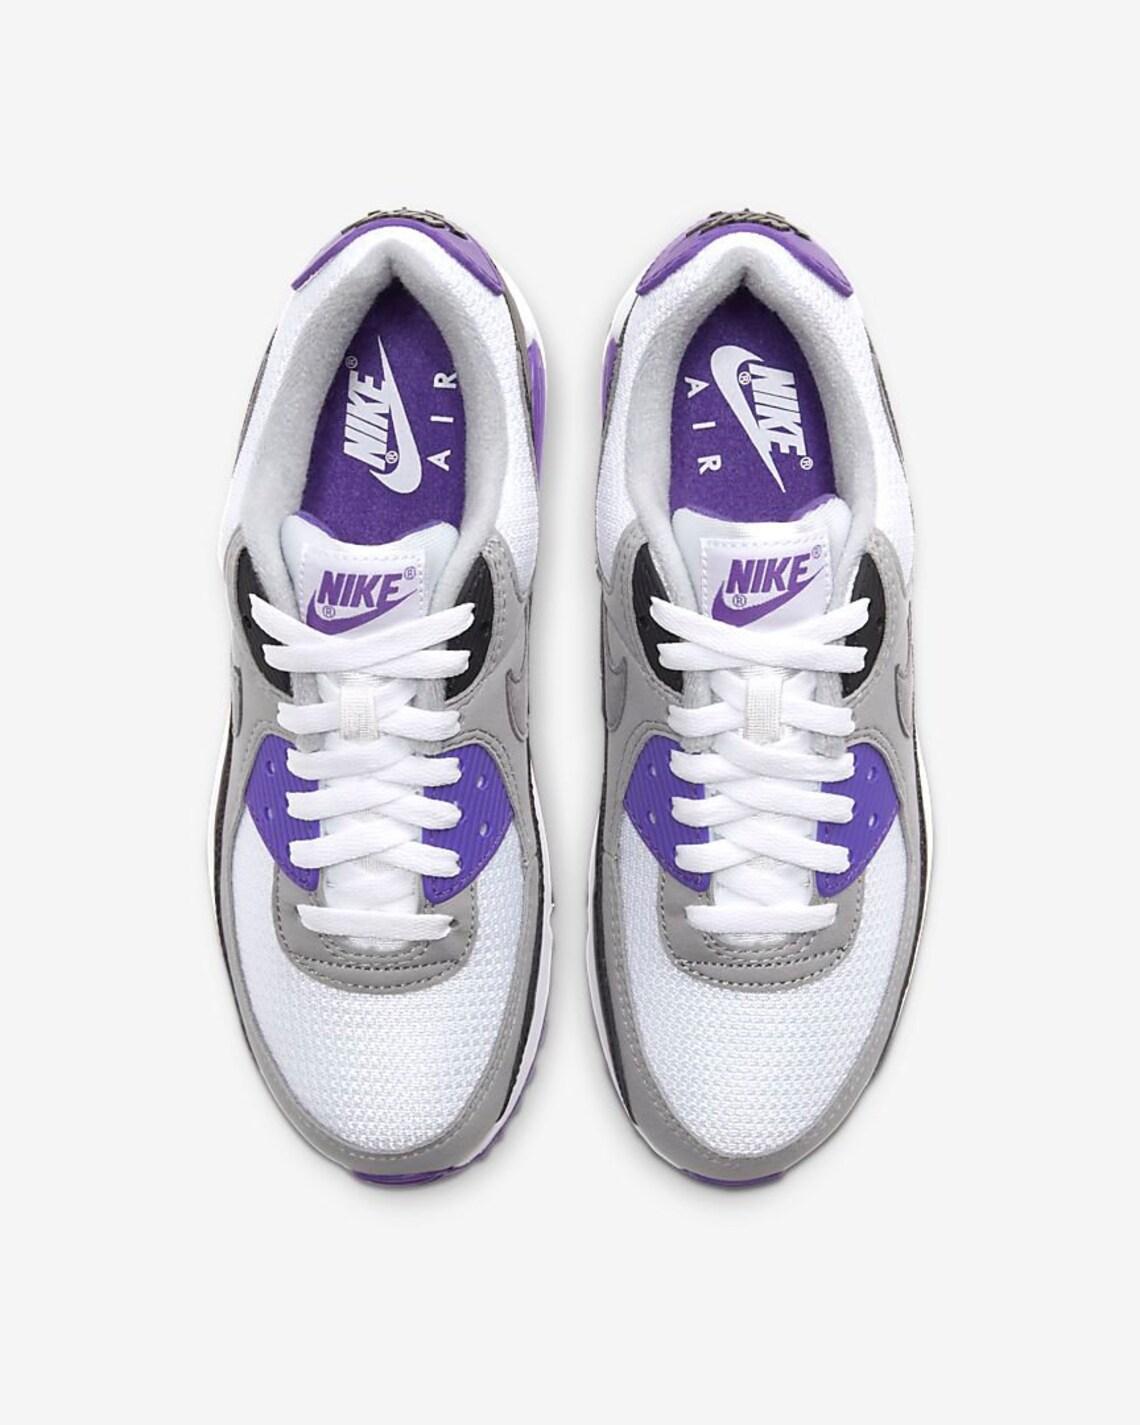 Swarovski Womens Nike Air Max 90 Purple Sneakers Customized